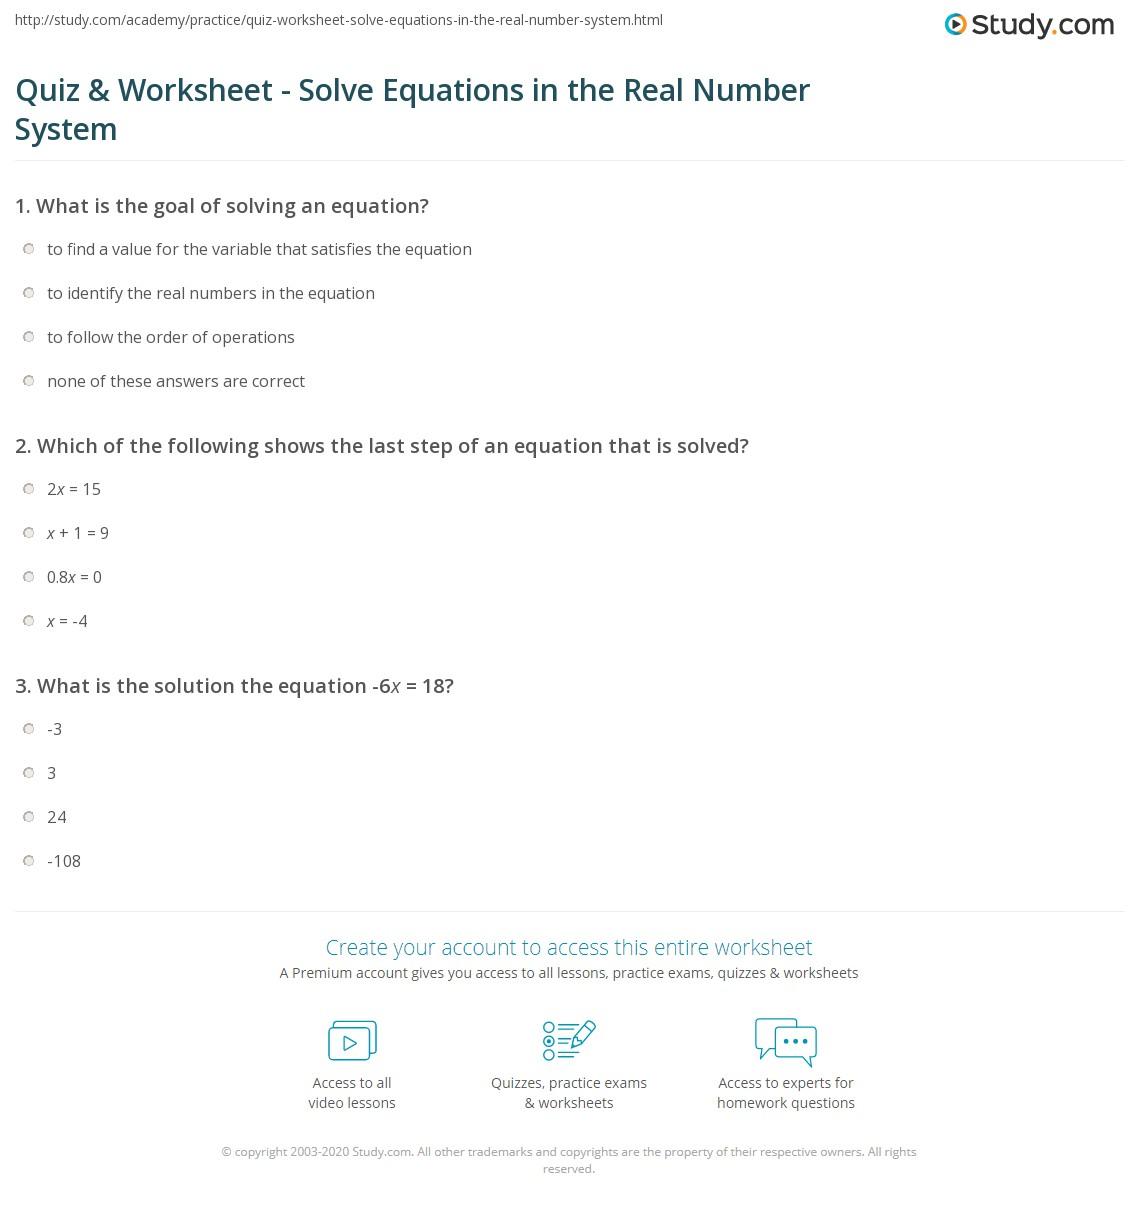 Printables Real Number System Worksheet quiz worksheet solve equations in the real number system print solving worksheet